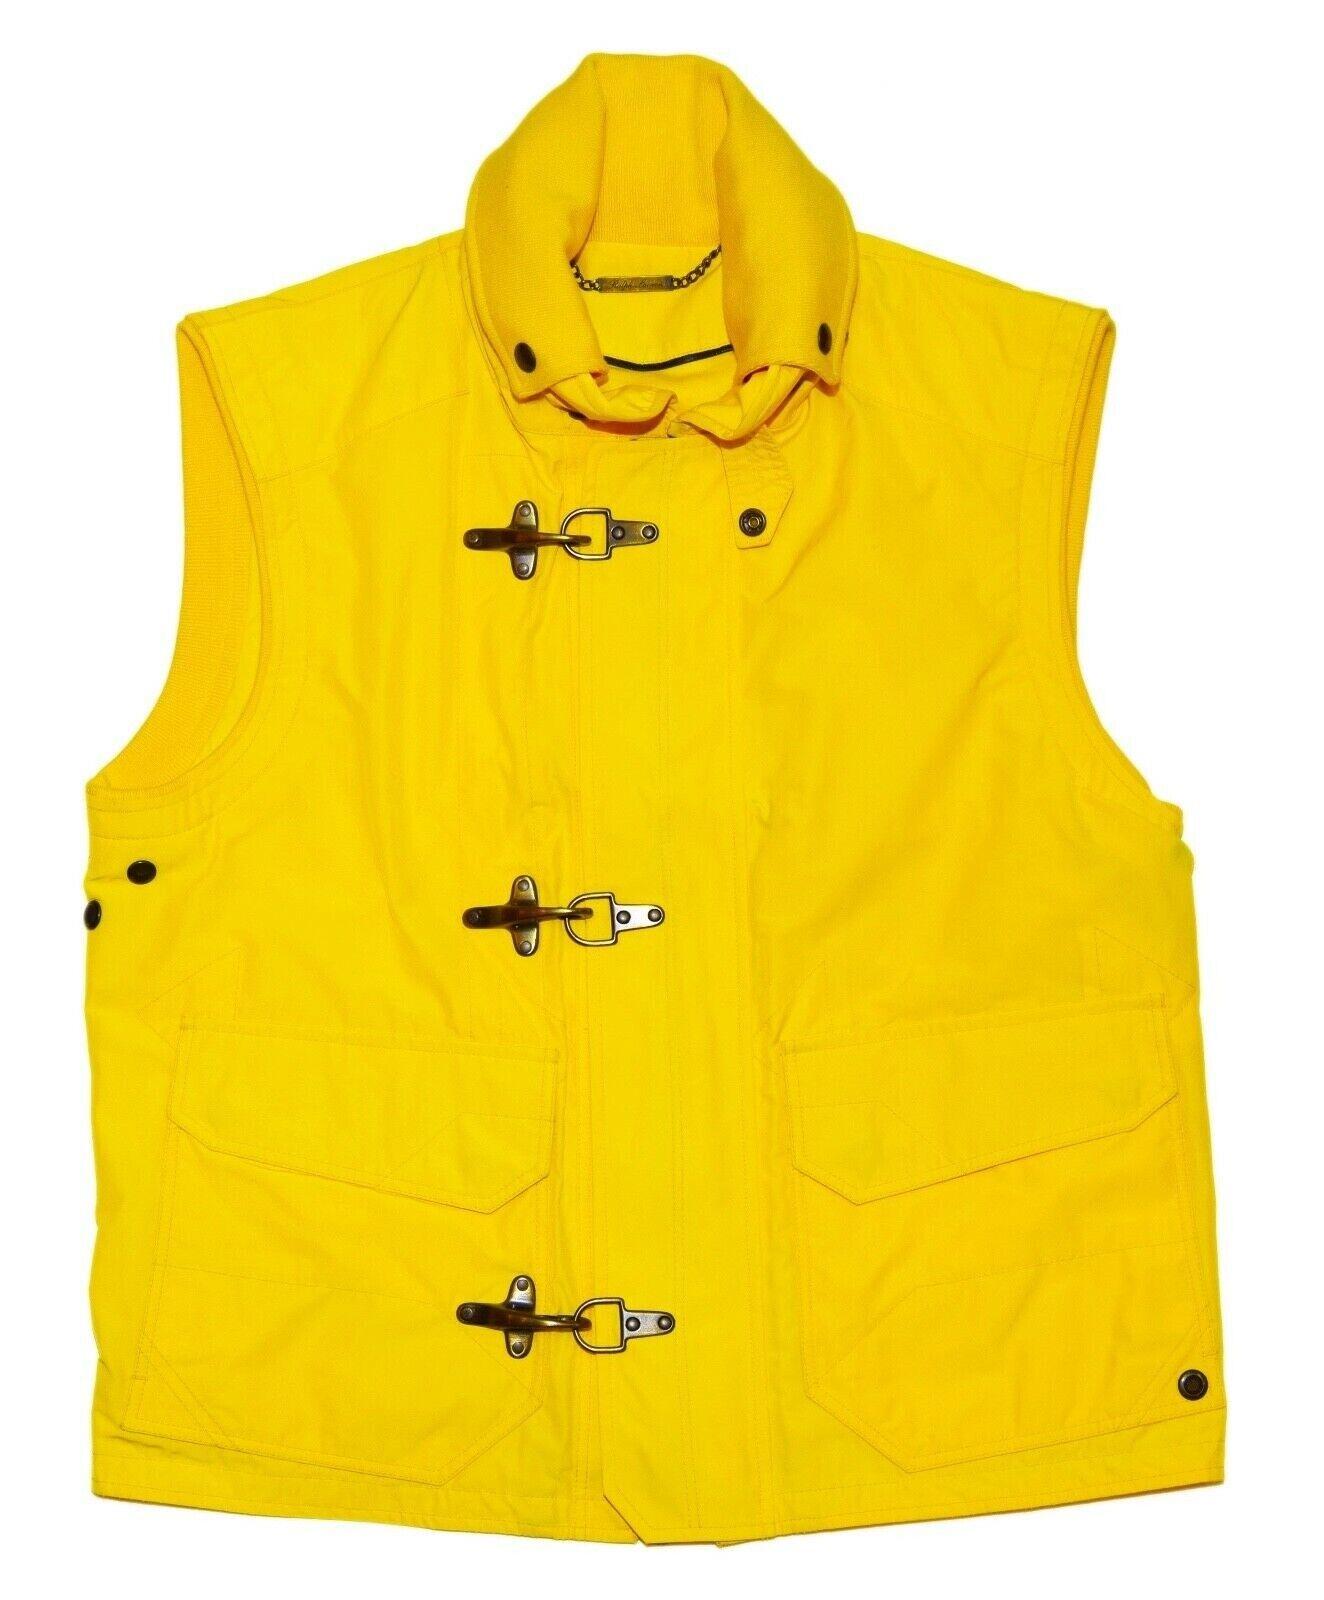 1995-ralph-lauren-purple-label-men-toggle-hooded-jacket-vest-italy-yellow-large